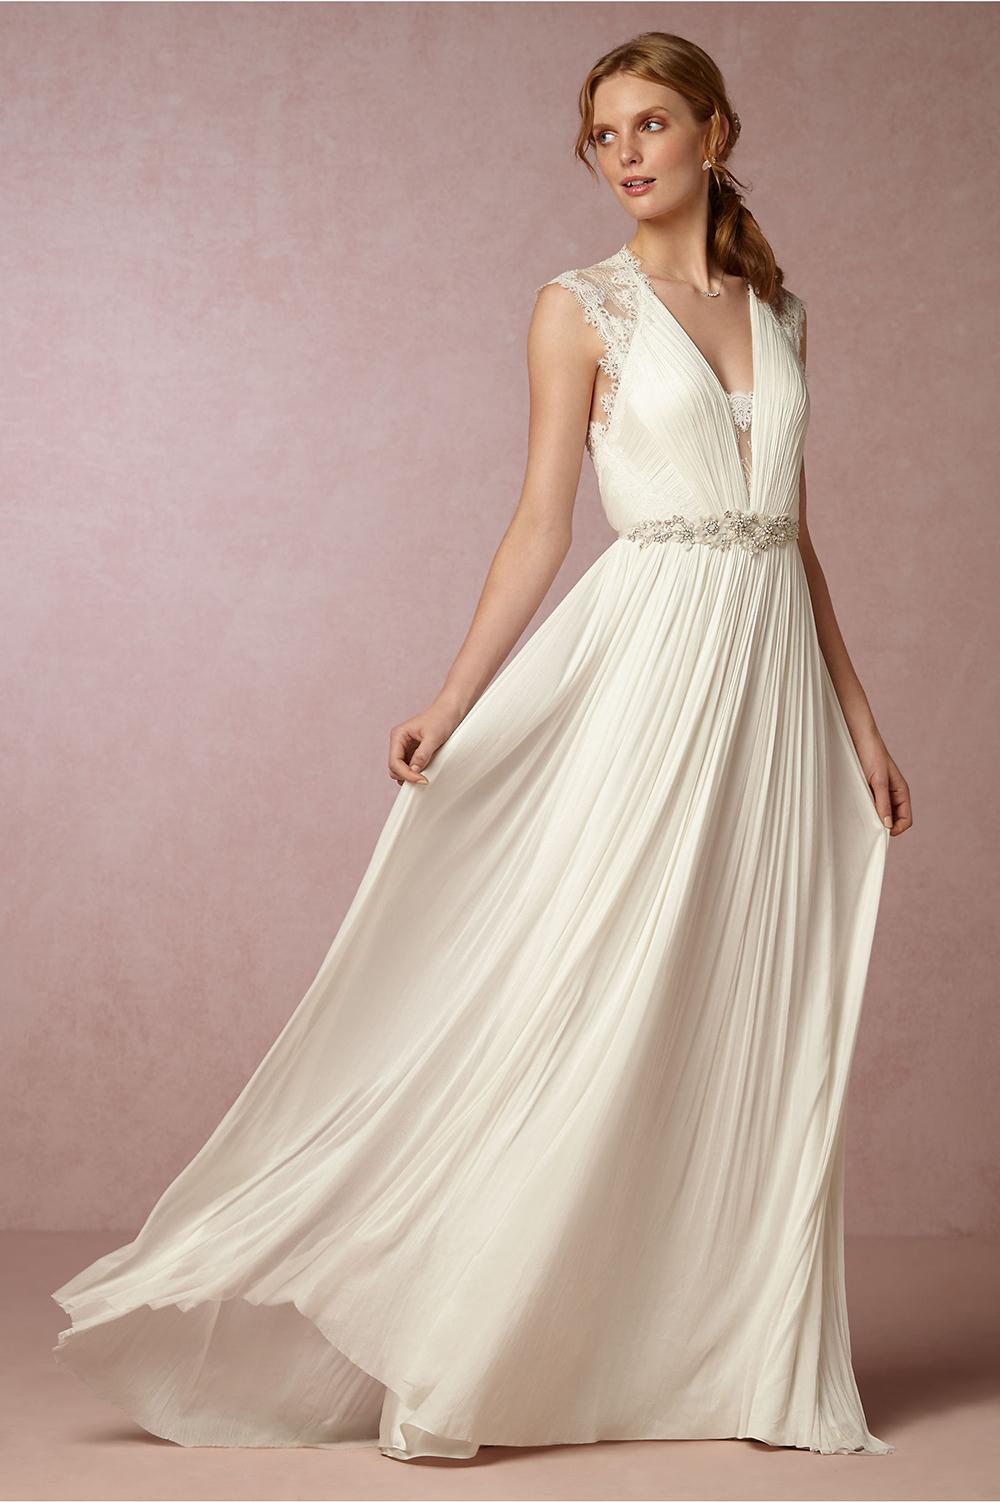 BHLDN Fantasia Gown - BHLDN Wedding Gowns